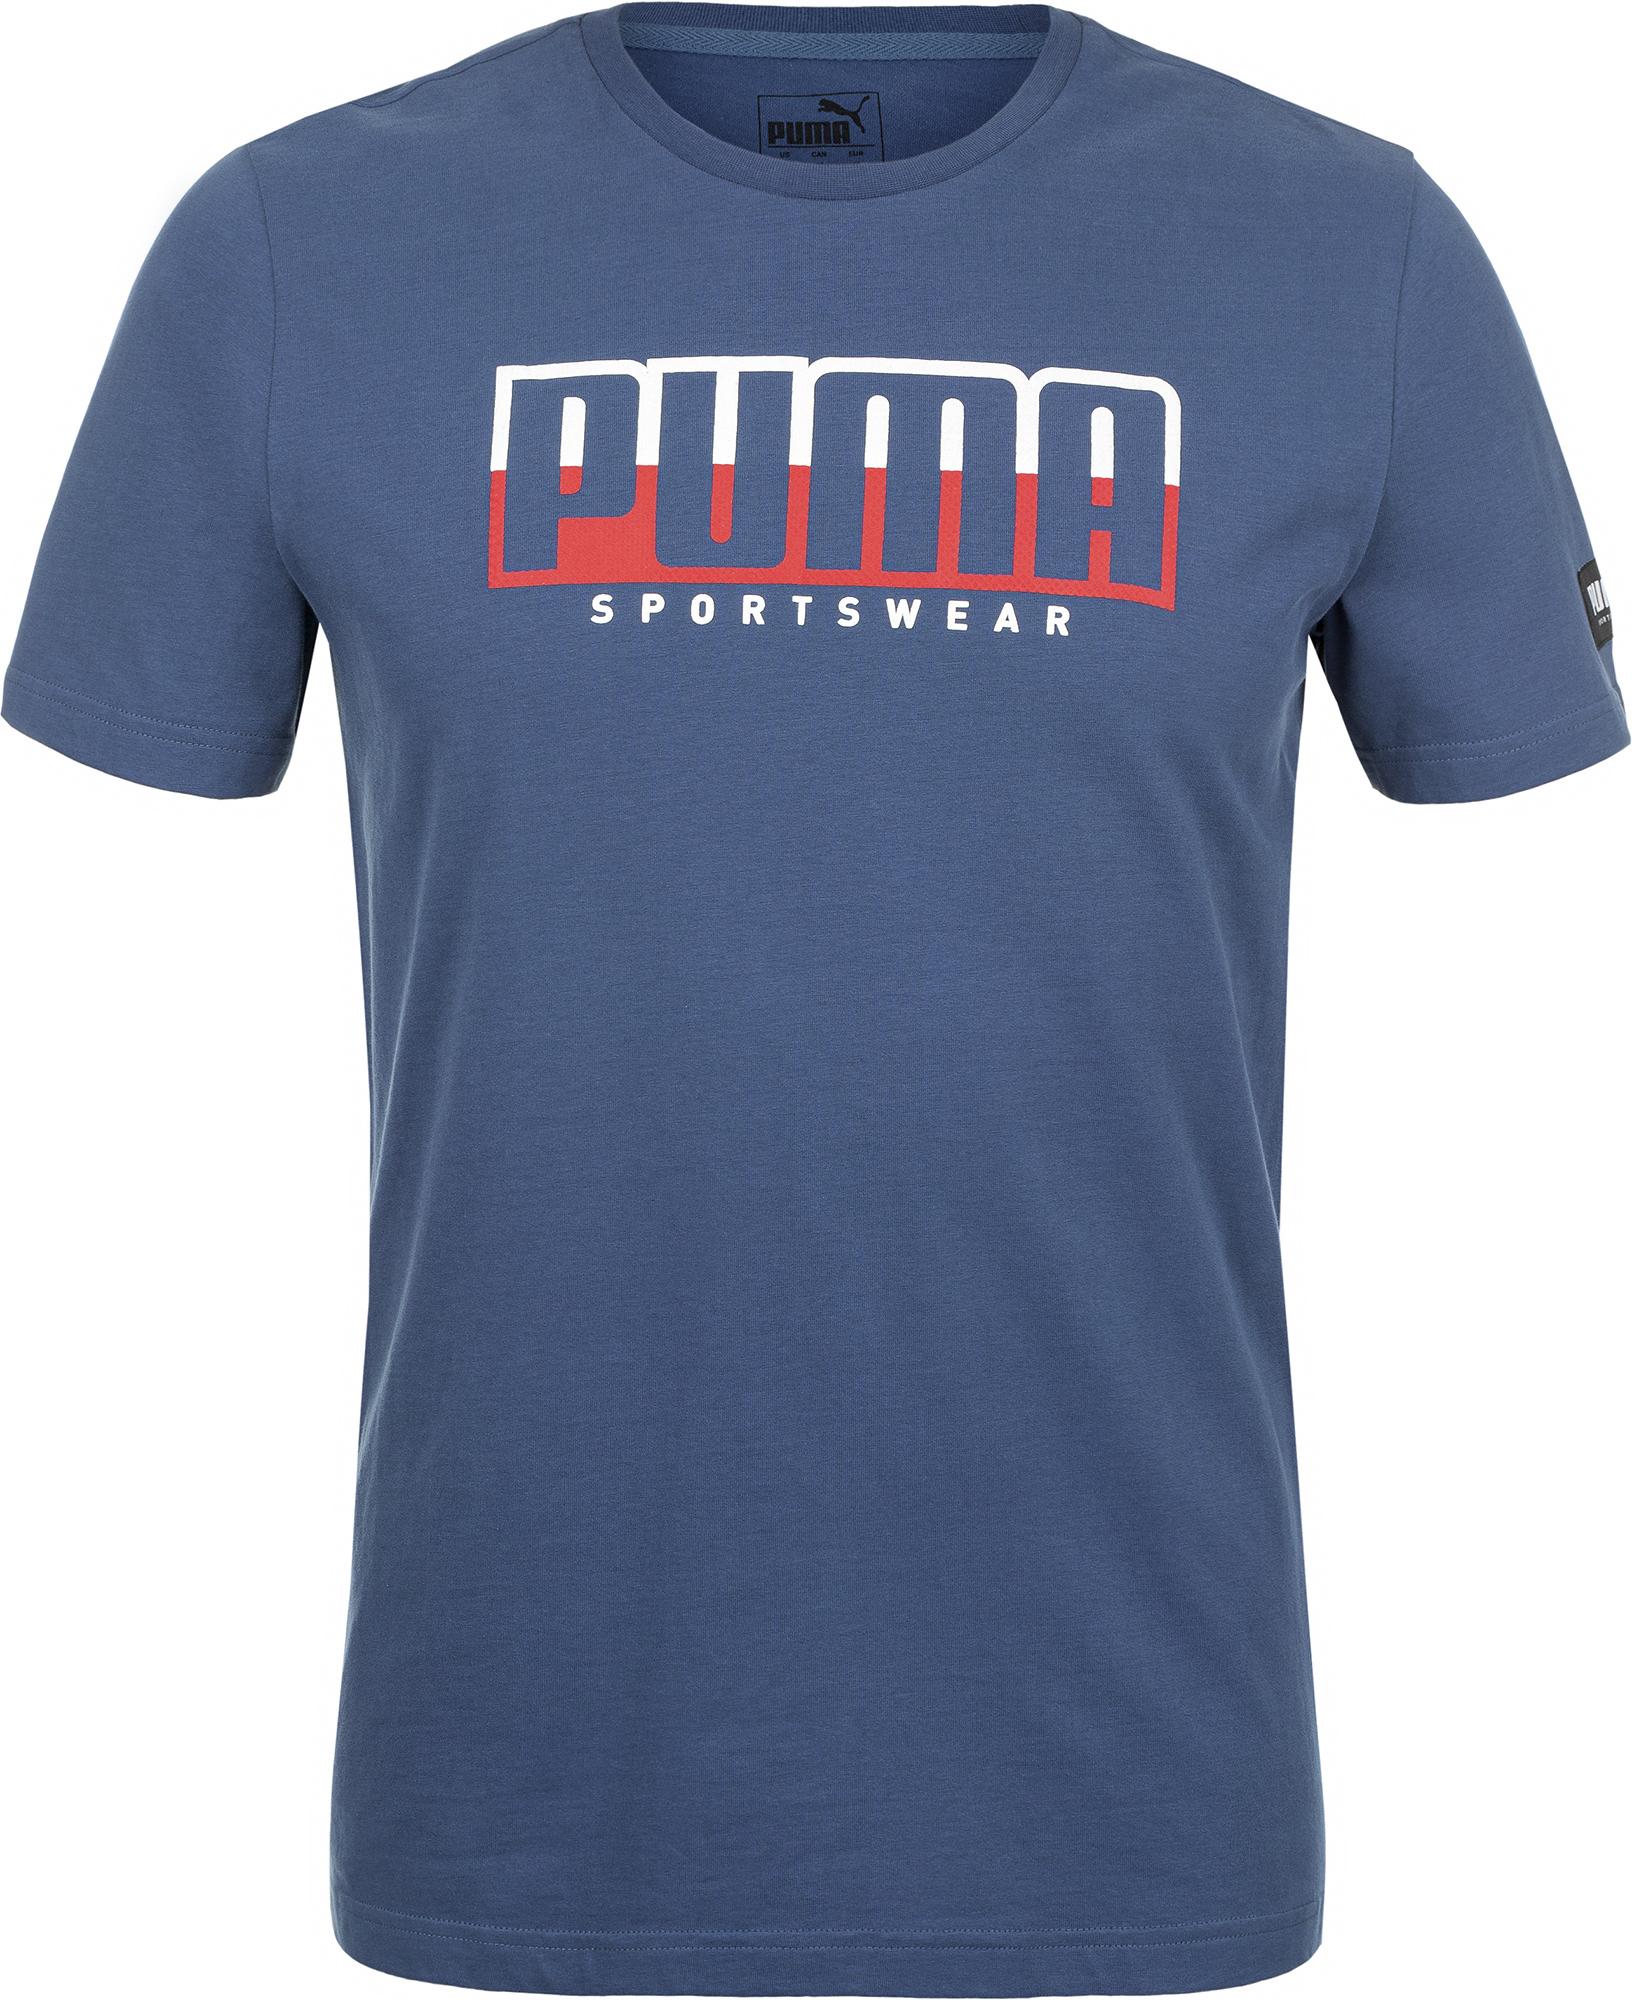 PUMA Футболка мужская Puma Athletics Tee Big Logo, размер 46-48